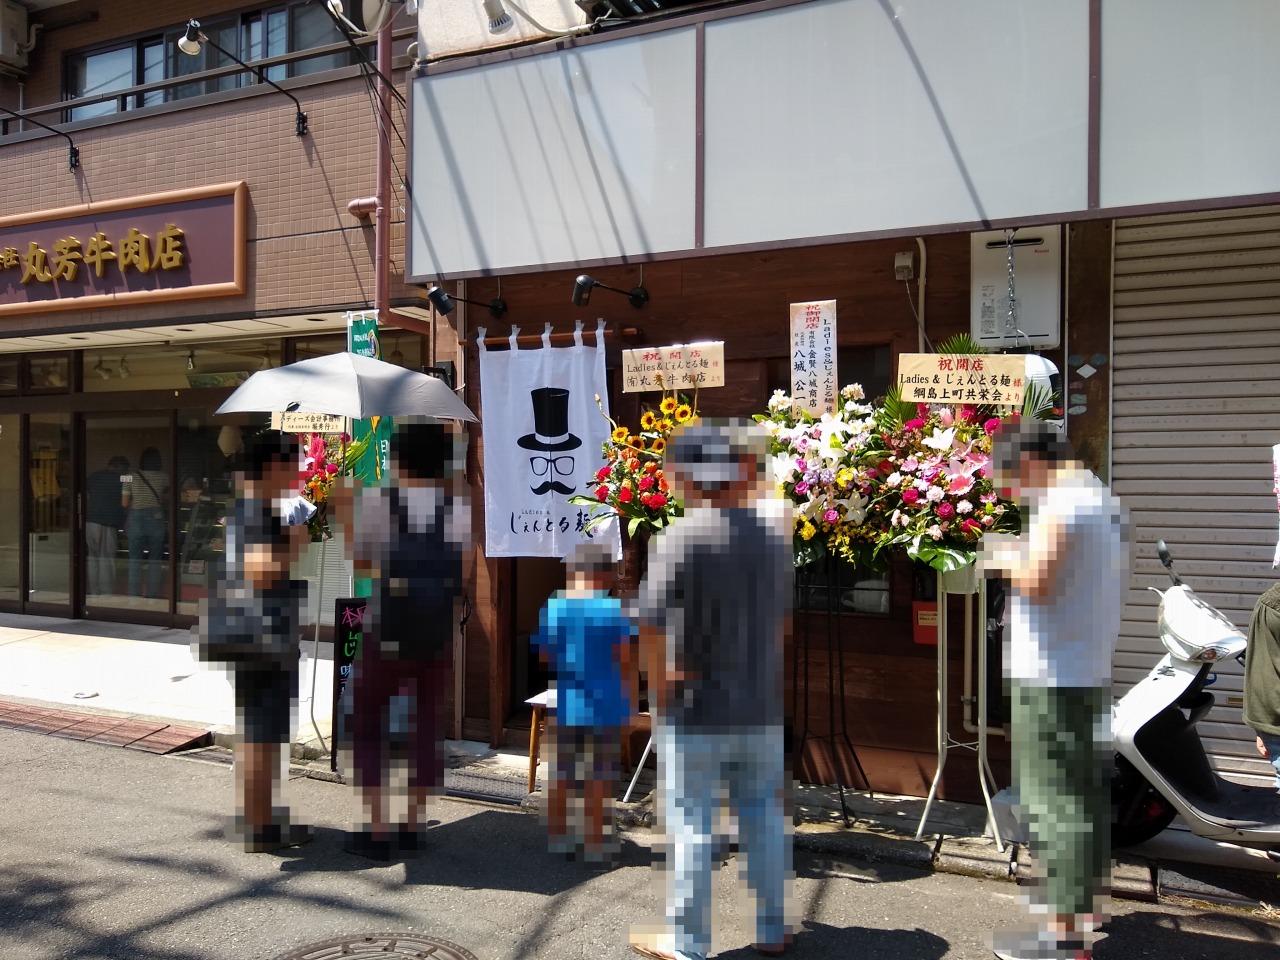 Ladies & じぇんとる麺の特製味噌ラーメン開店当日